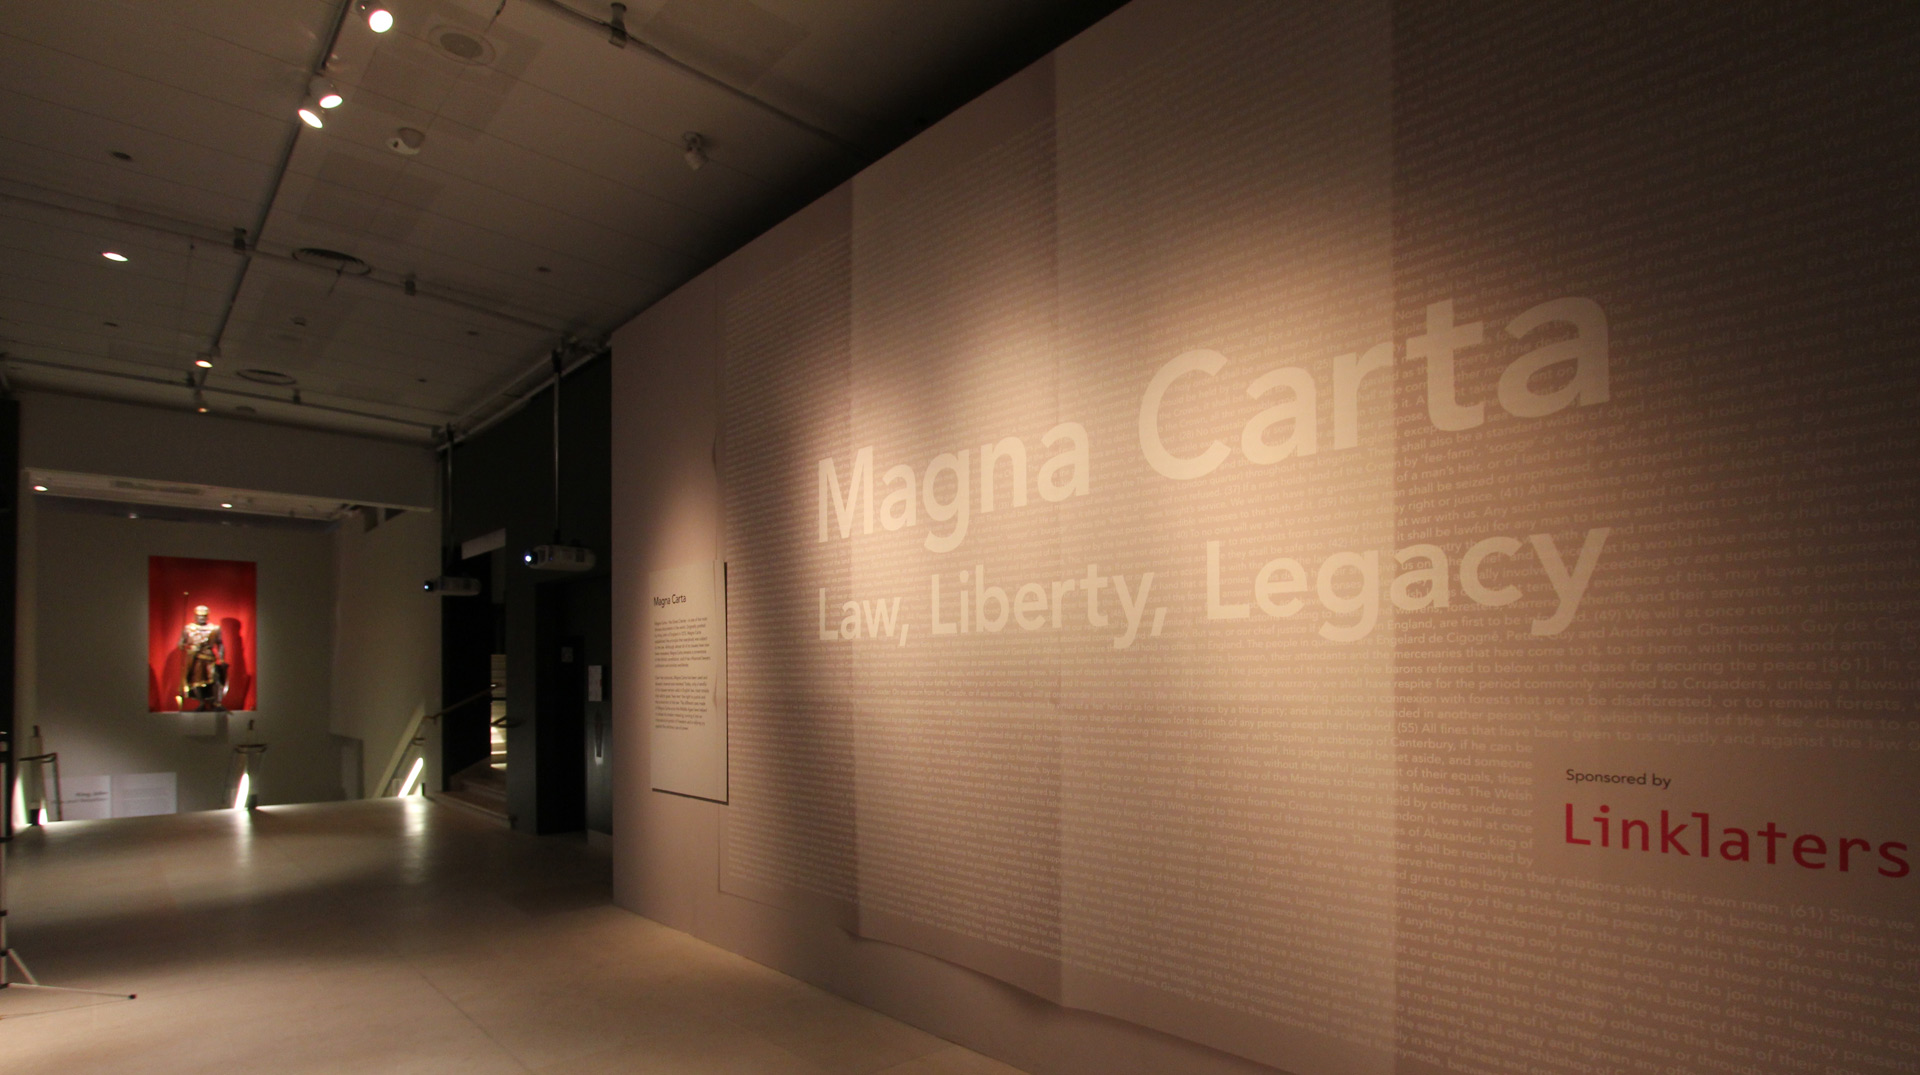 magna-carta-01.jpg